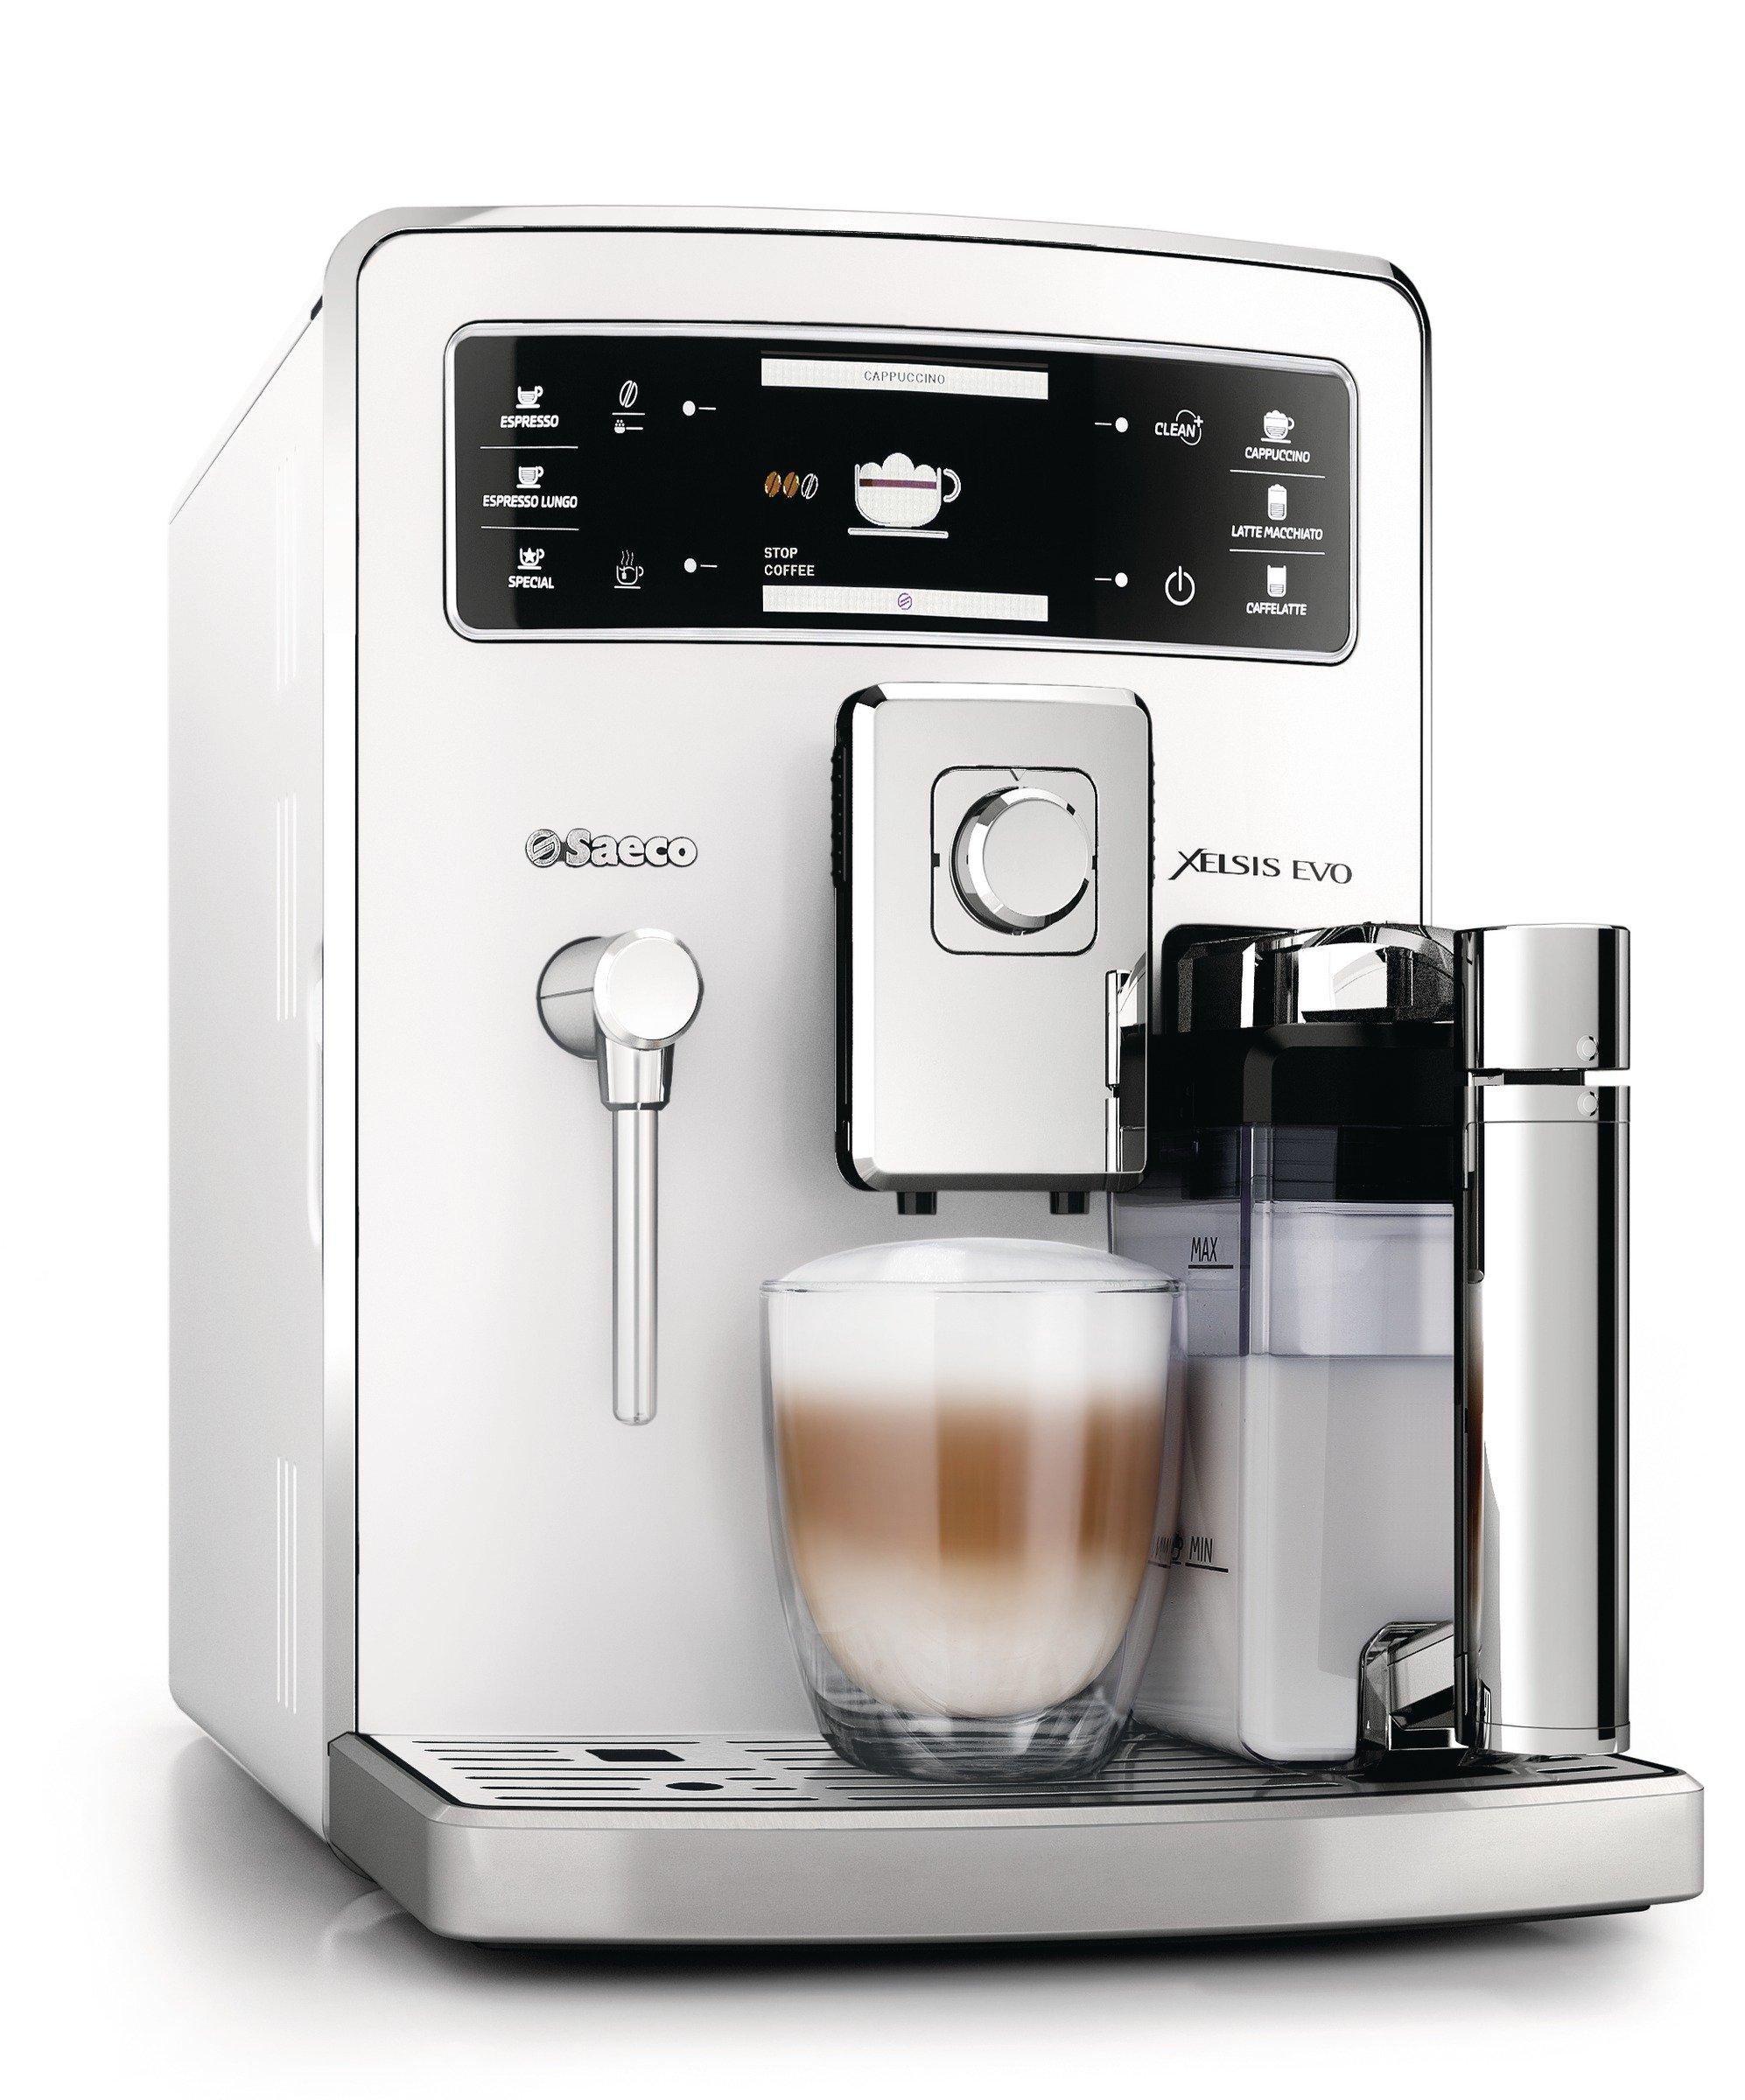 Saeco-HD895321-Xelsis-Evo-Kaffeevollautomat-15-bar-integrierte-Milchkaraffe-wei